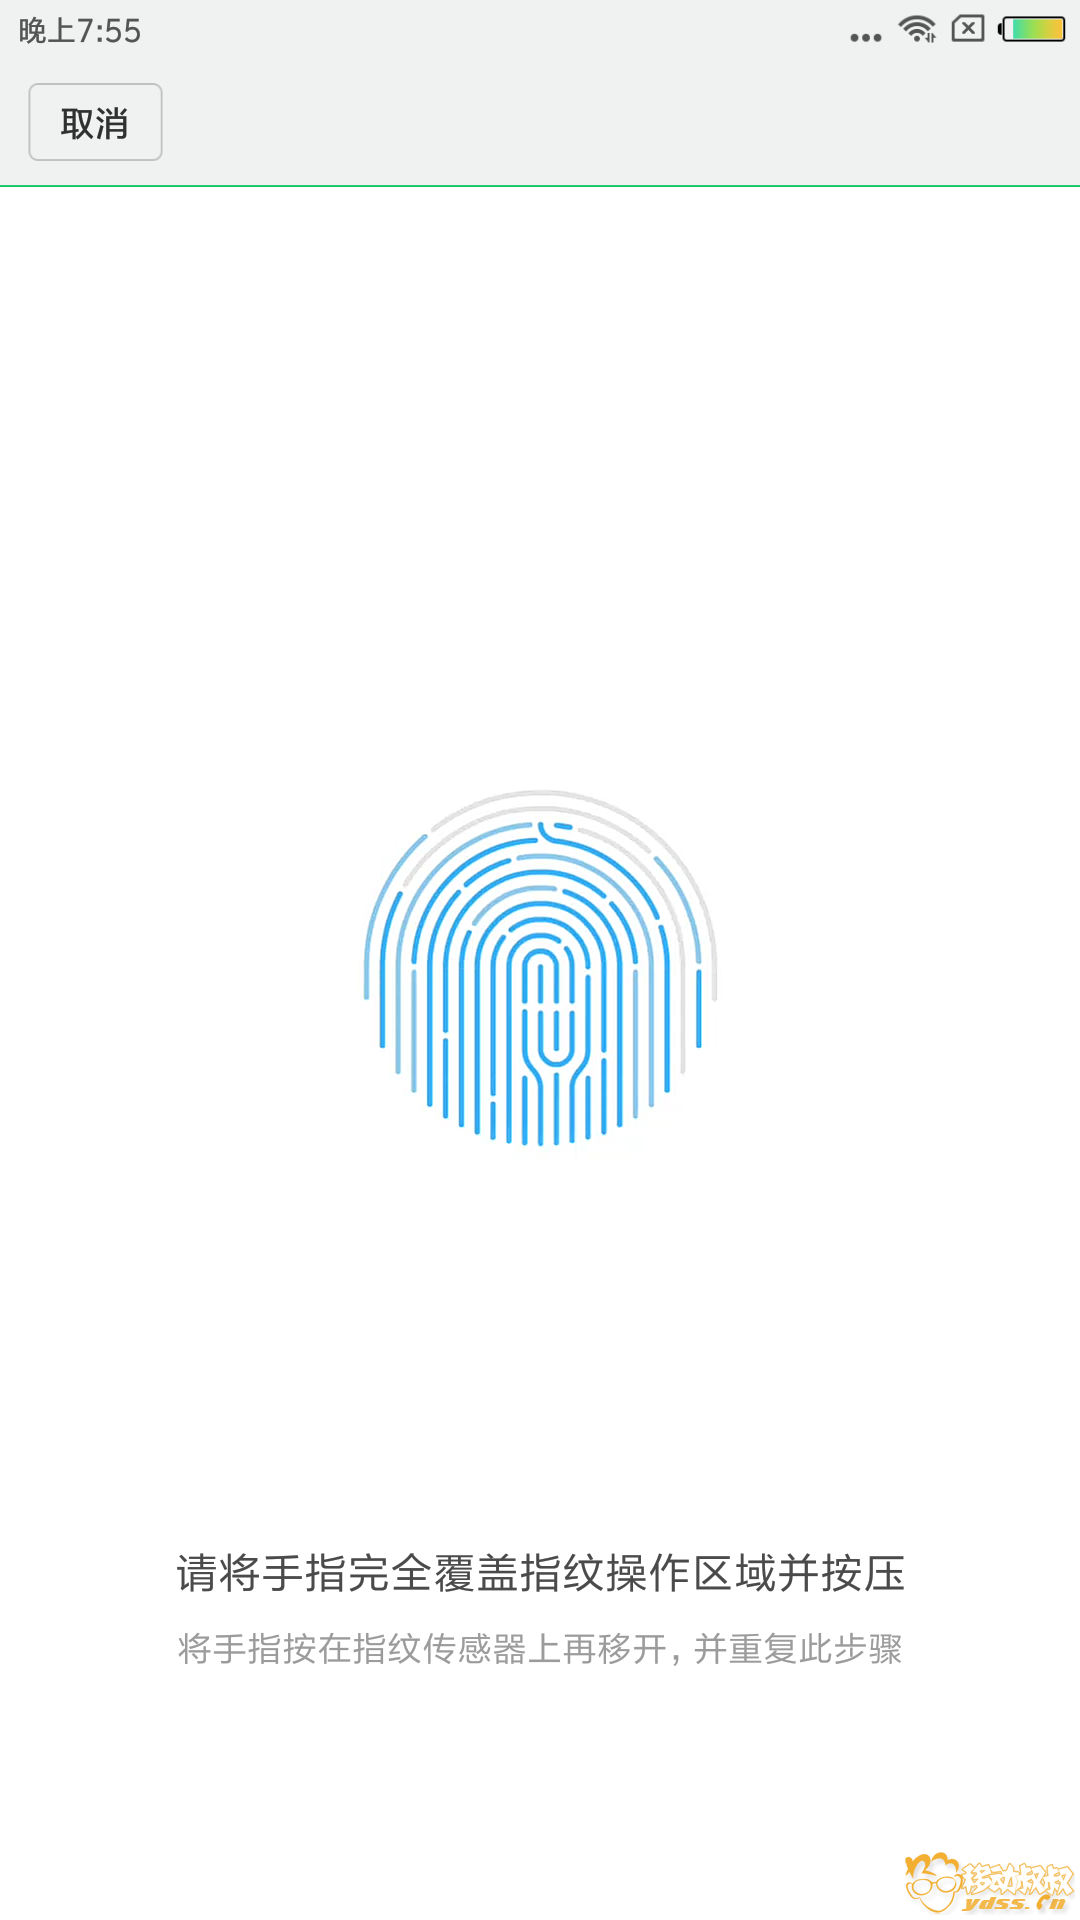 Screenshot_2017-11-04-19-55-03-427_com.android.settings - 副本.png